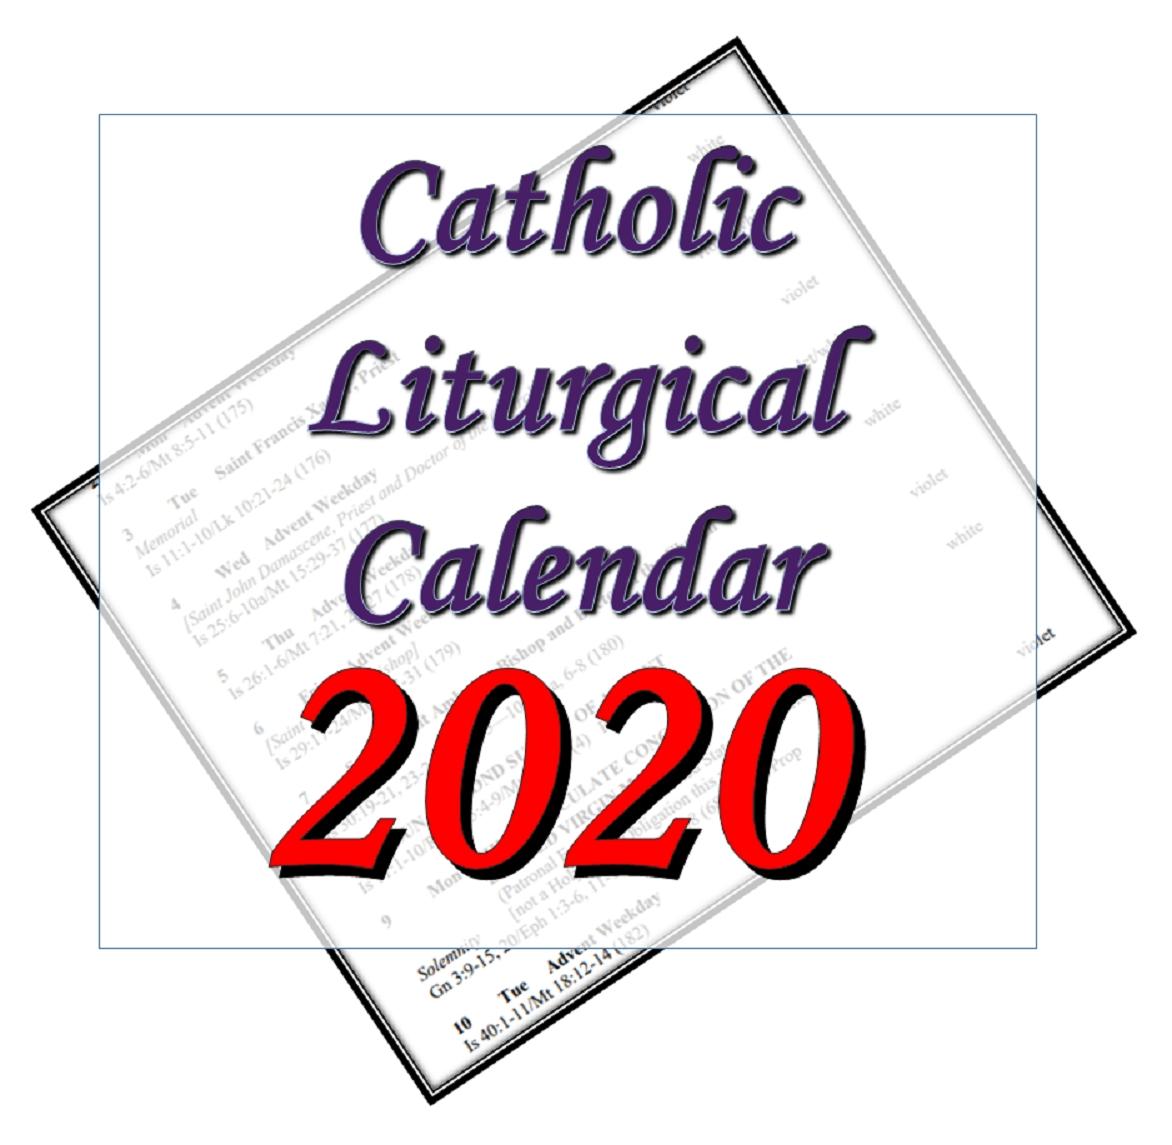 Liturgytools: Catholic Liturgical Calendars For 2020 for Liturgical Calendar 2019 2020 Catholic